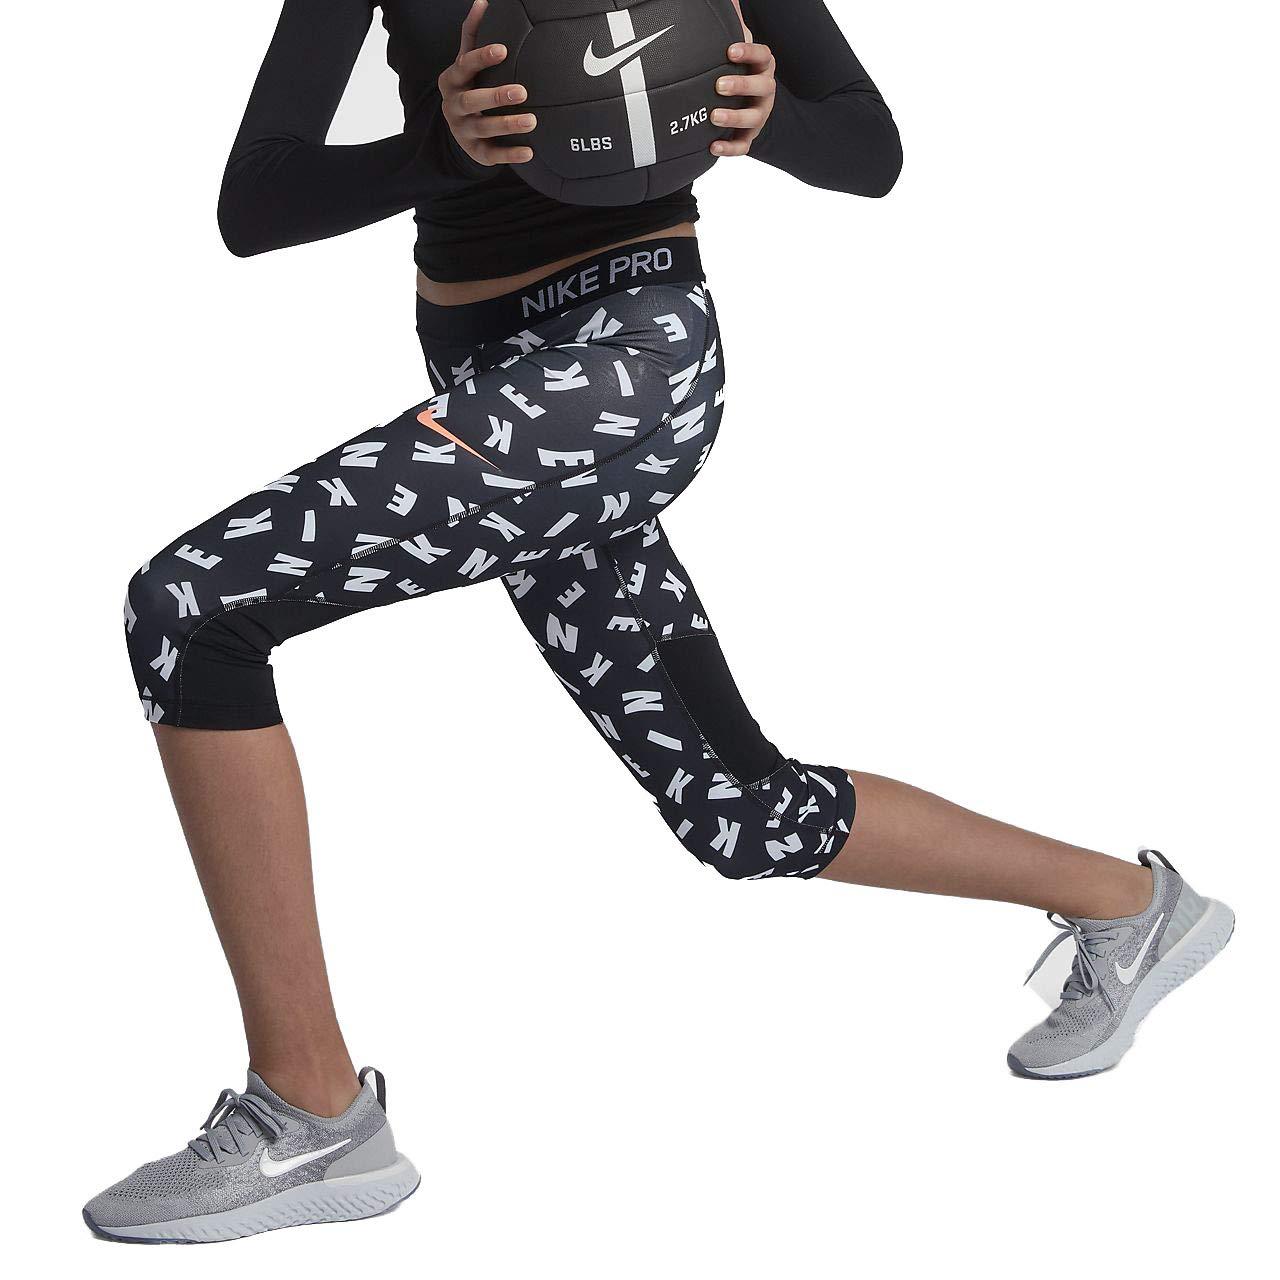 Noir cramoisi S Nike Girl's Pro Toss Impression Corsaire